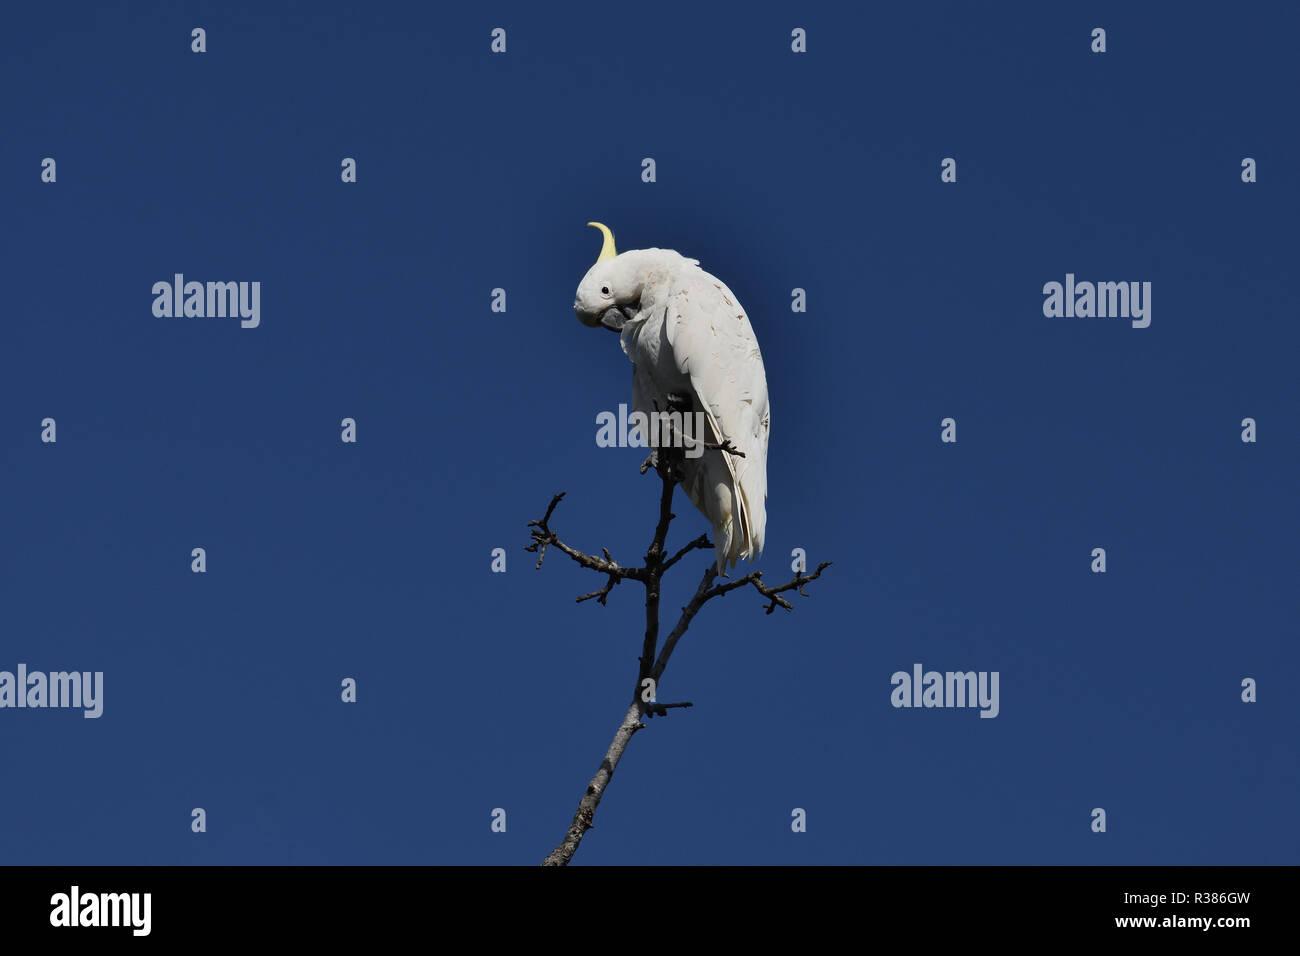 An Australian, Queensland Sulphur-crested Cockatoo ( Cacatua galerita ) perched high up on a tree preening itself - Stock Image